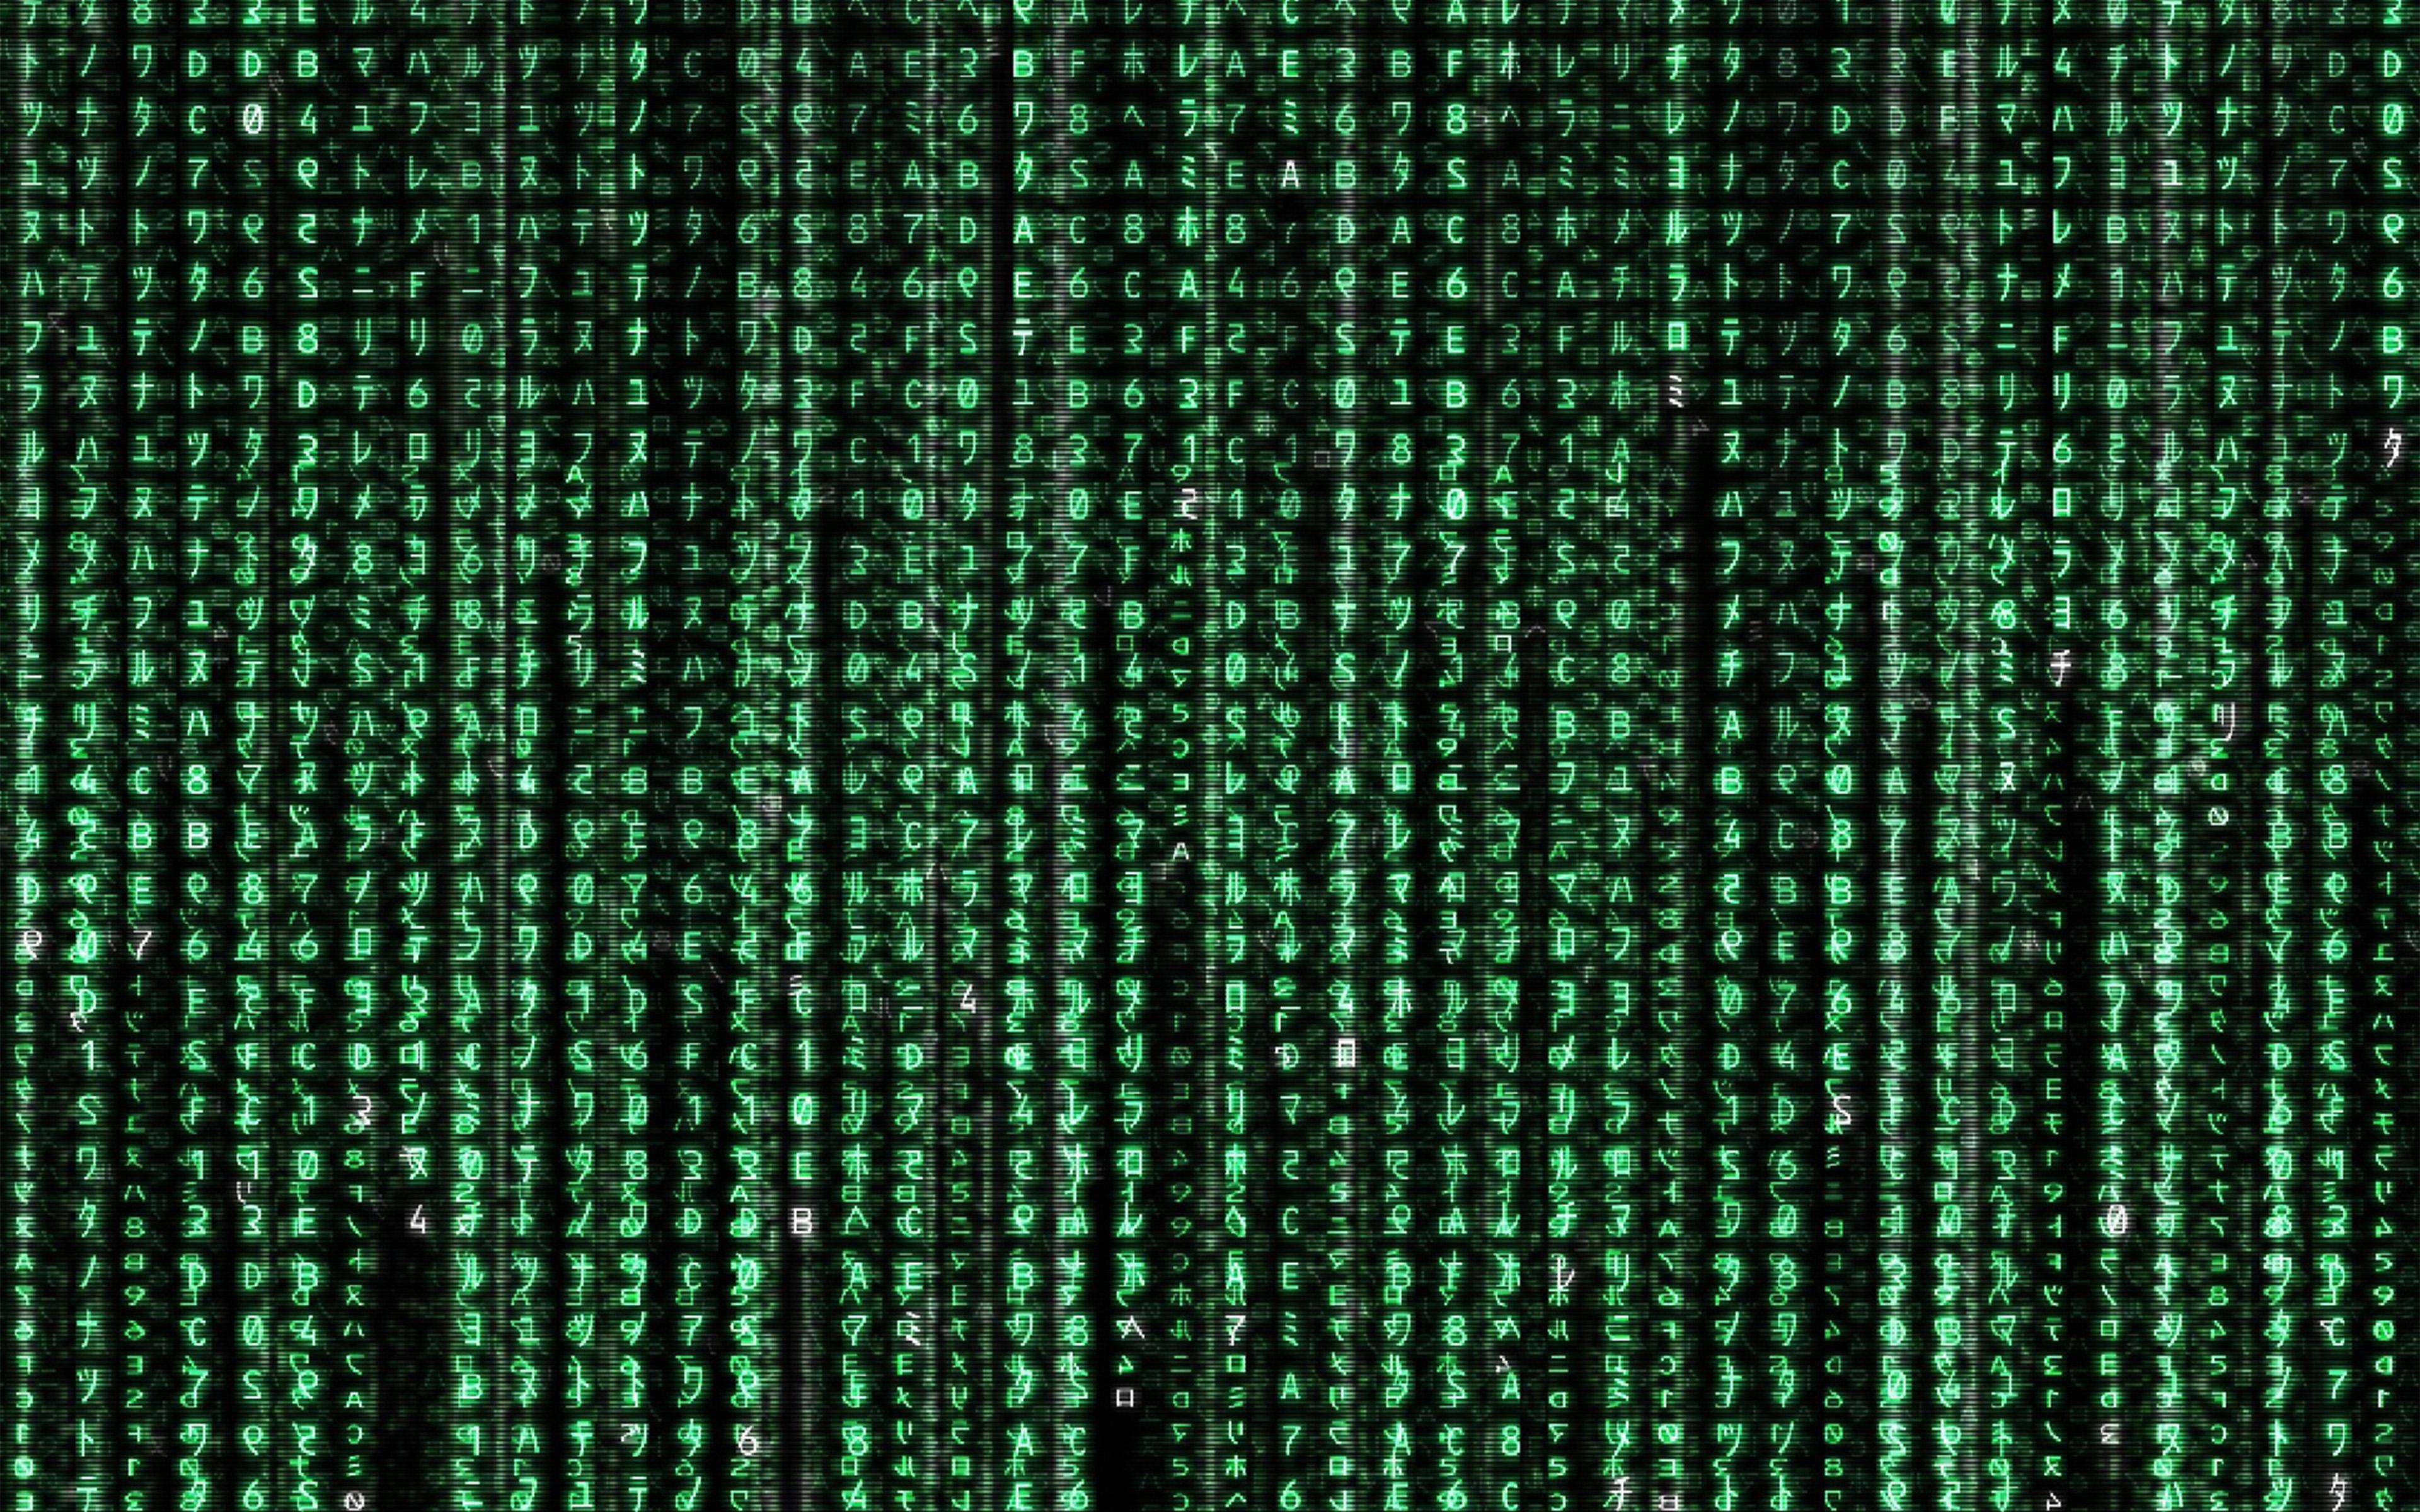 vv58-matrix-texture-film-pattern-background-wallpaper